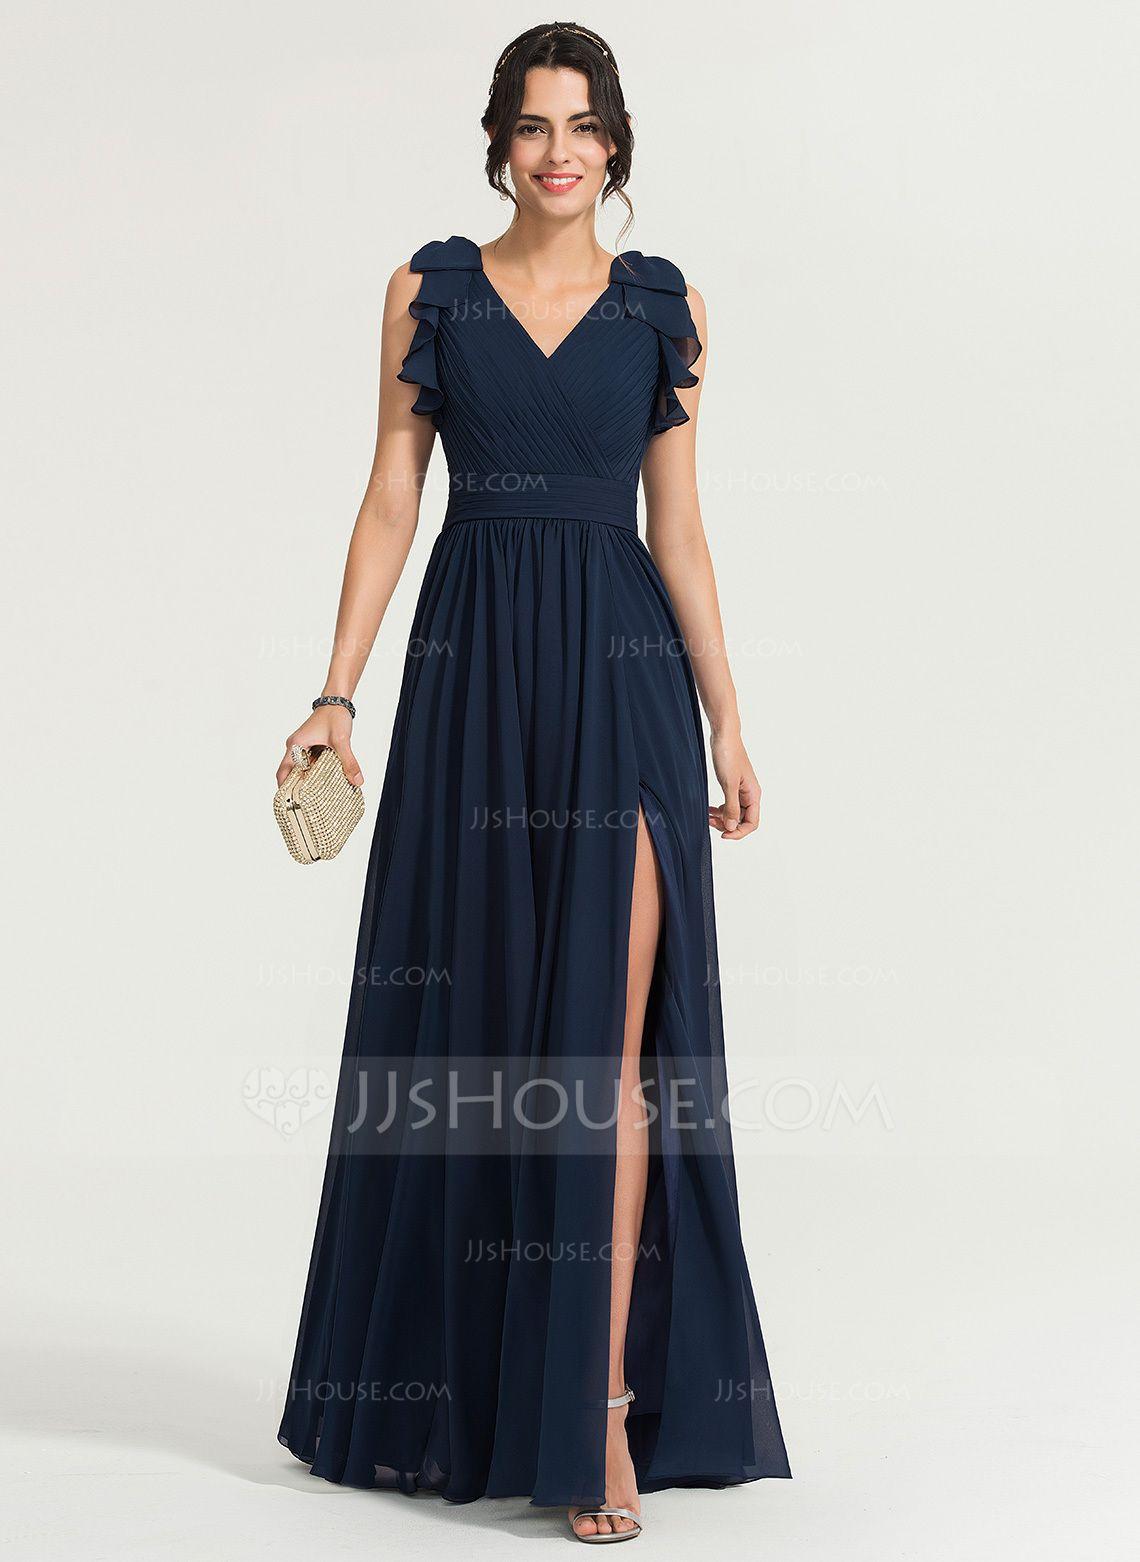 Photo of [€ 142.00] A-Line V-neck Floor-length Chiffon Wedding Dress